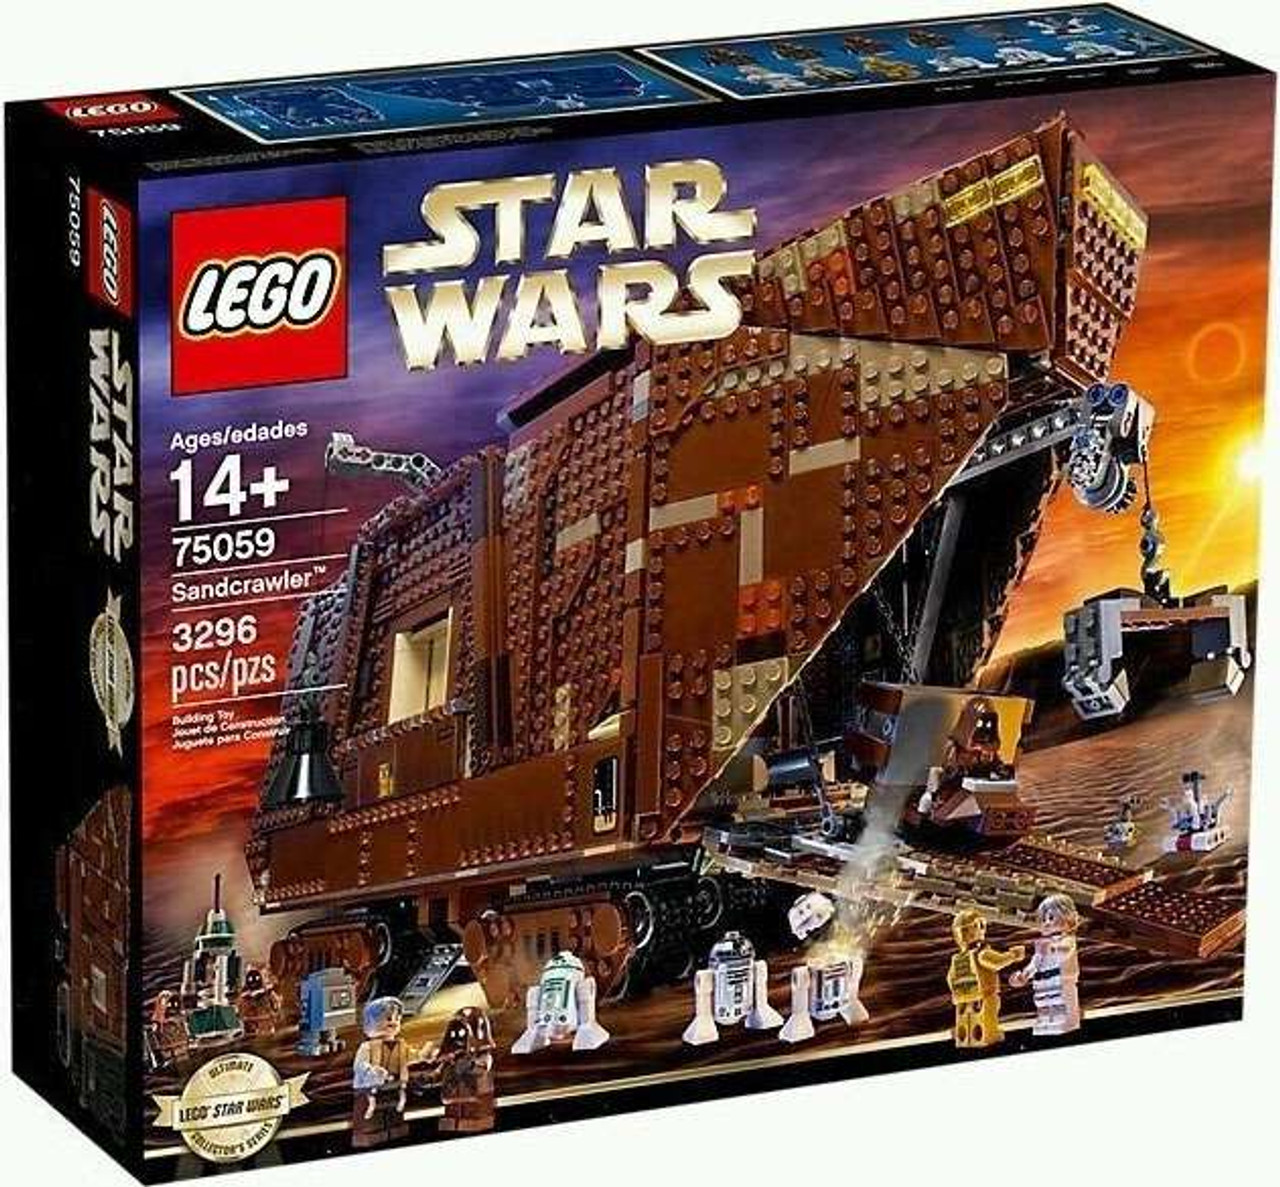 lego star wars a new hope sandcrawler set 75059 damaged